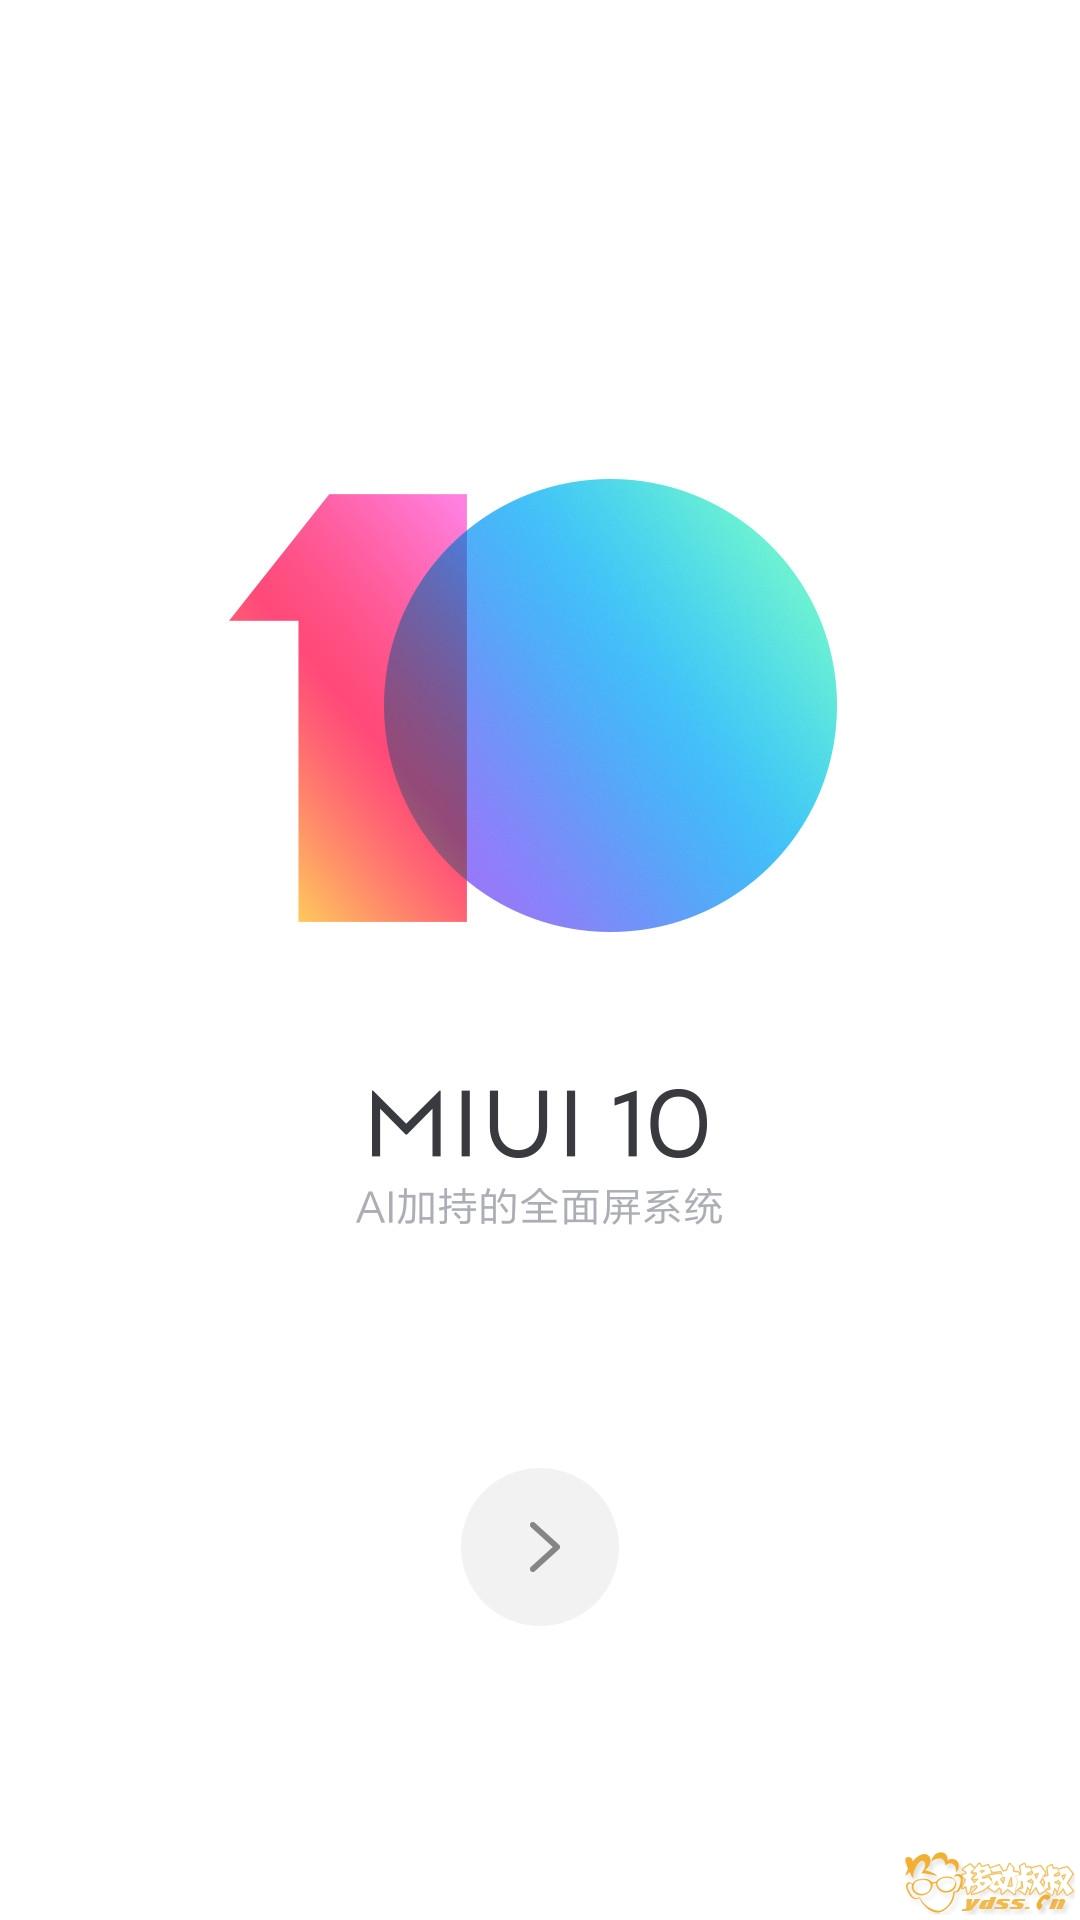 Screenshot_2018-07-04-17-03-31-538_com.android.provision.jpg